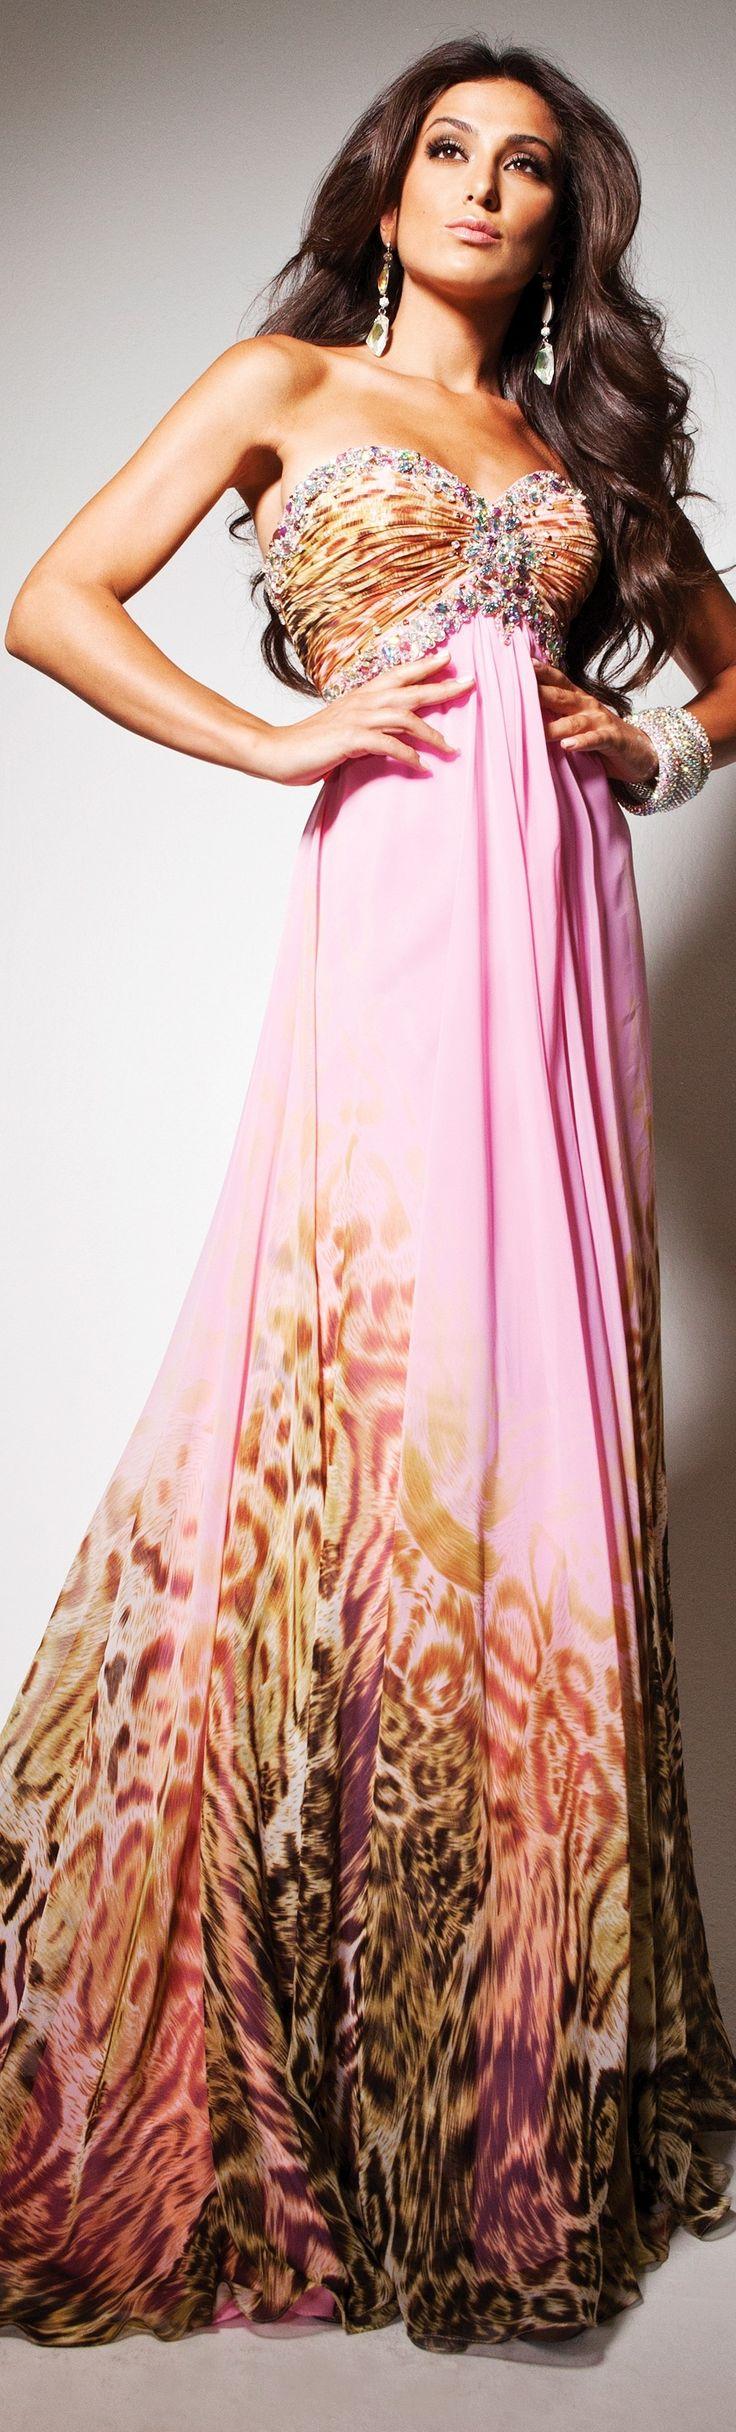 593 best DRESS*✿*⁀*♡* *☆*⁀*❀* • ♪ ♪ images on Pinterest | Ball ...